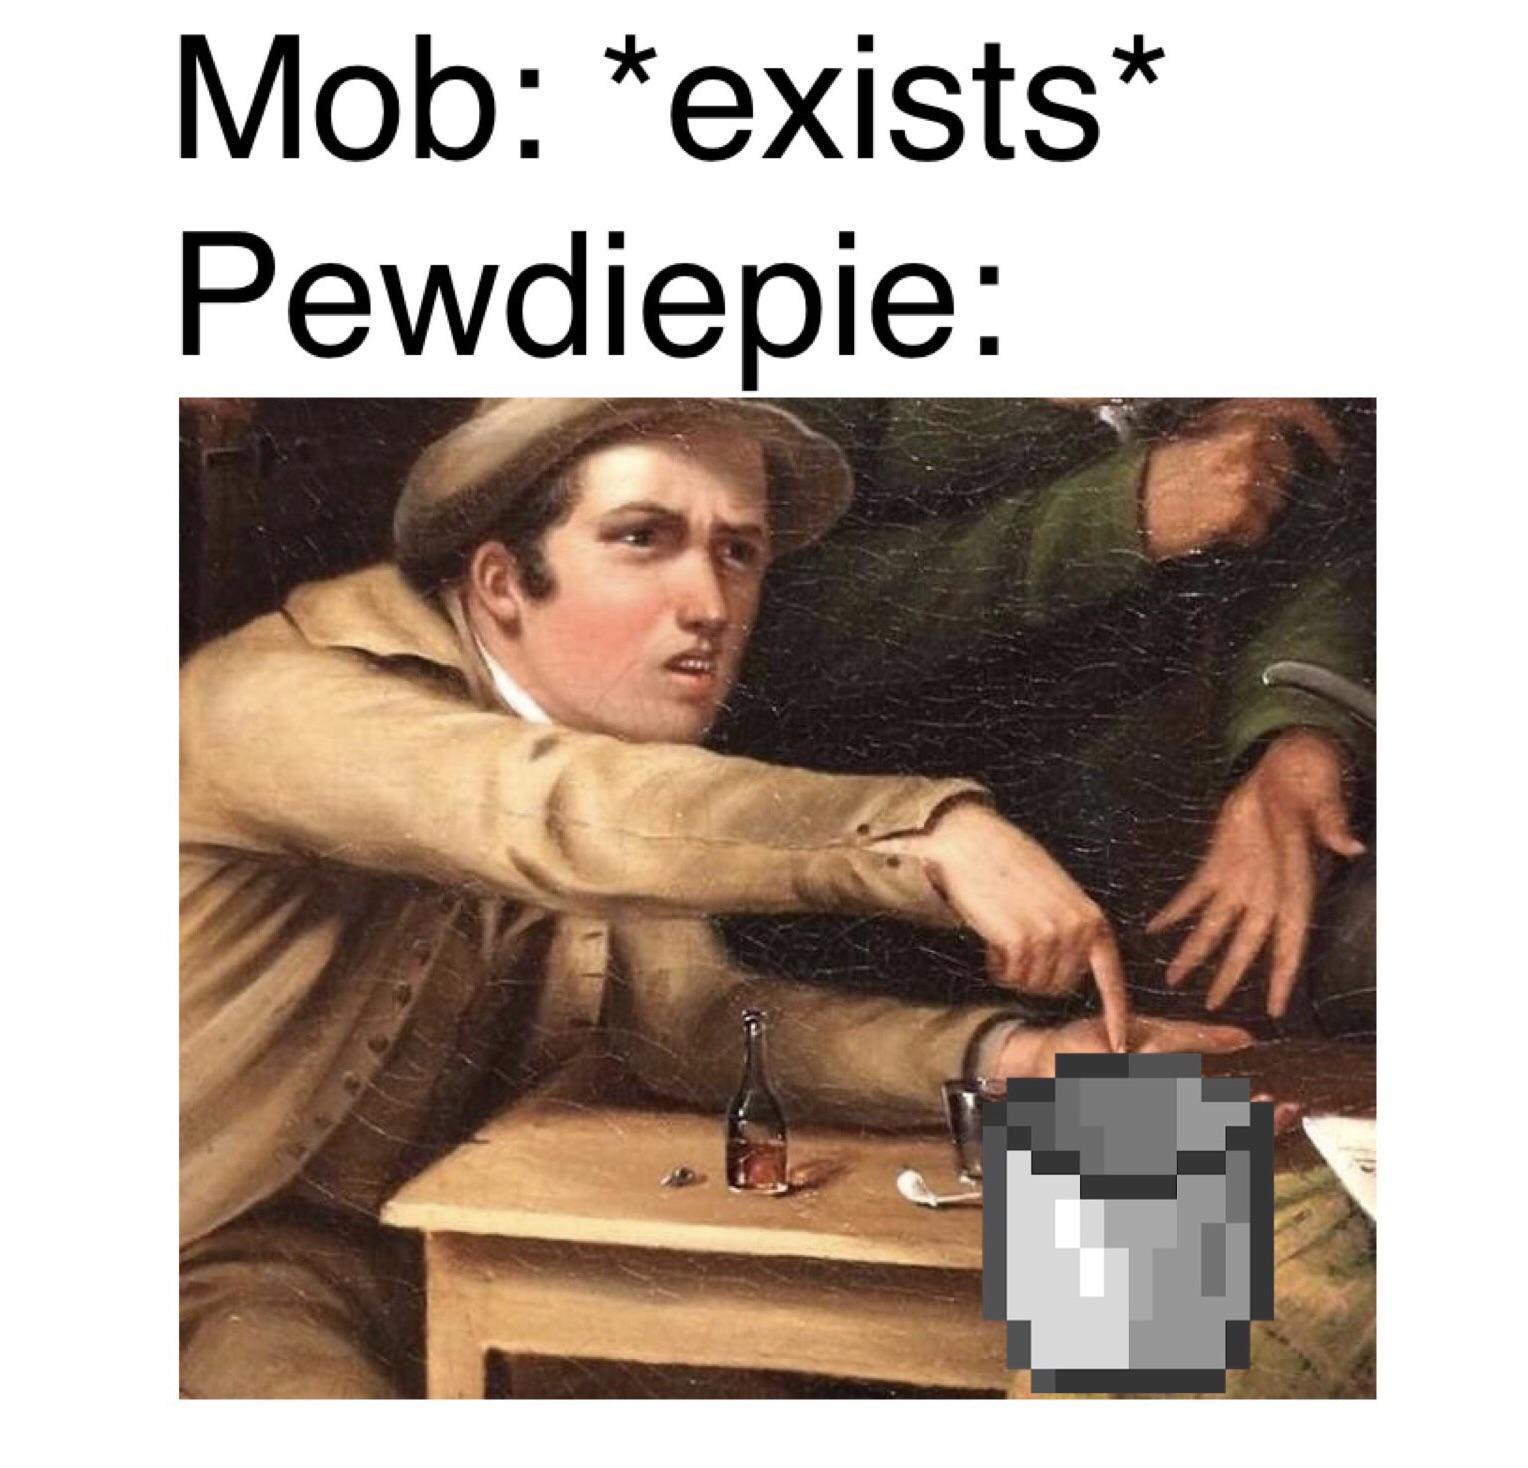 Hi - meme